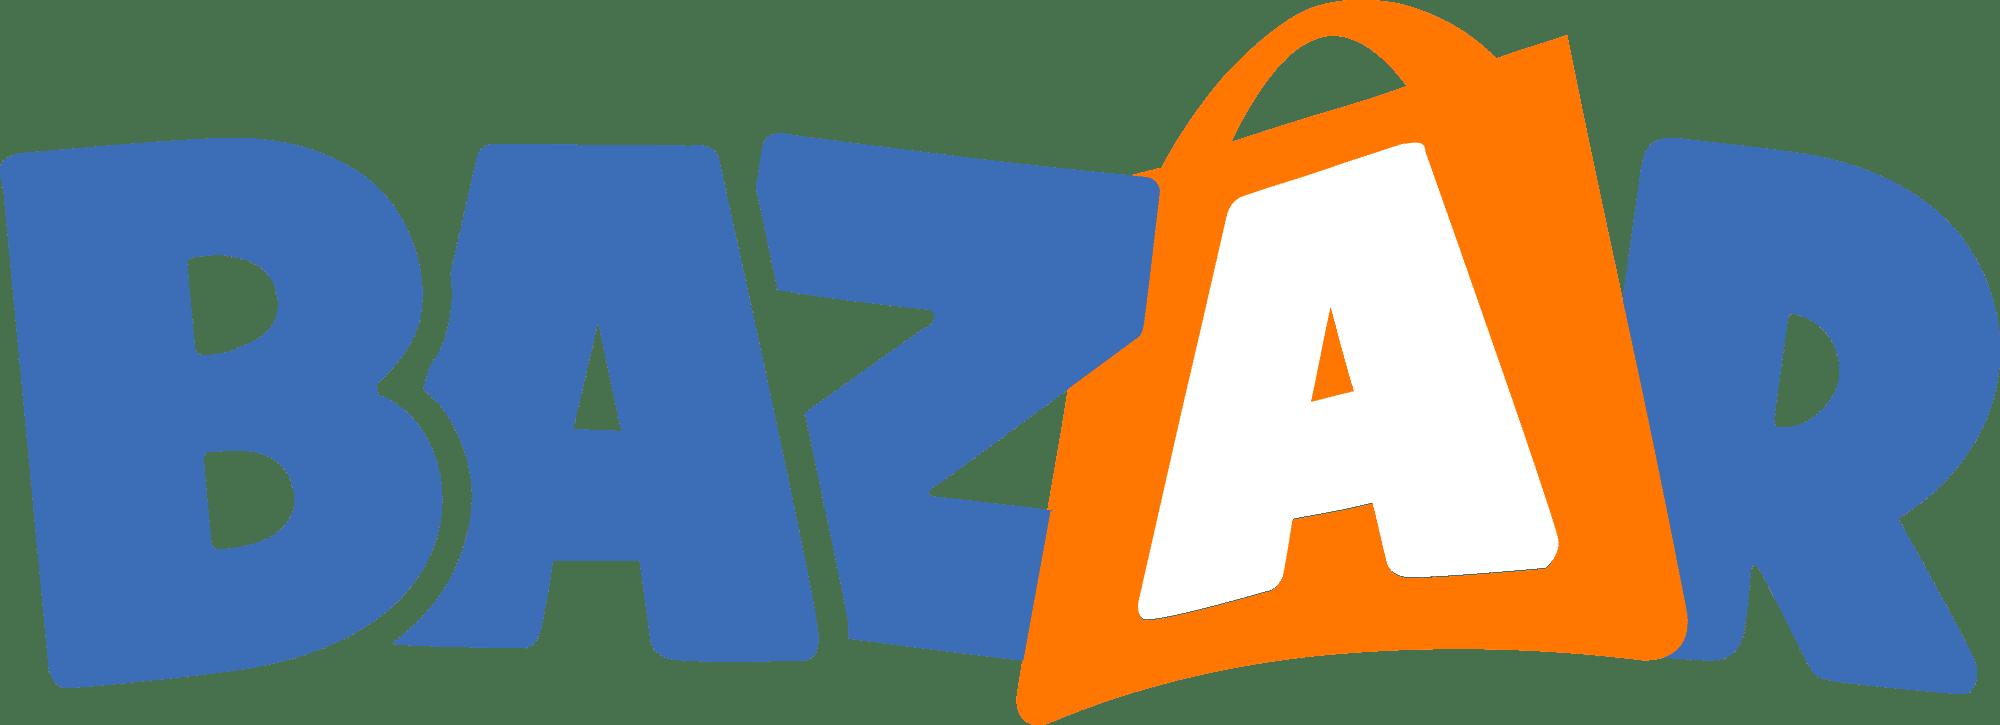 GMedia Facebook Ads Marketing Bazar.bg Client